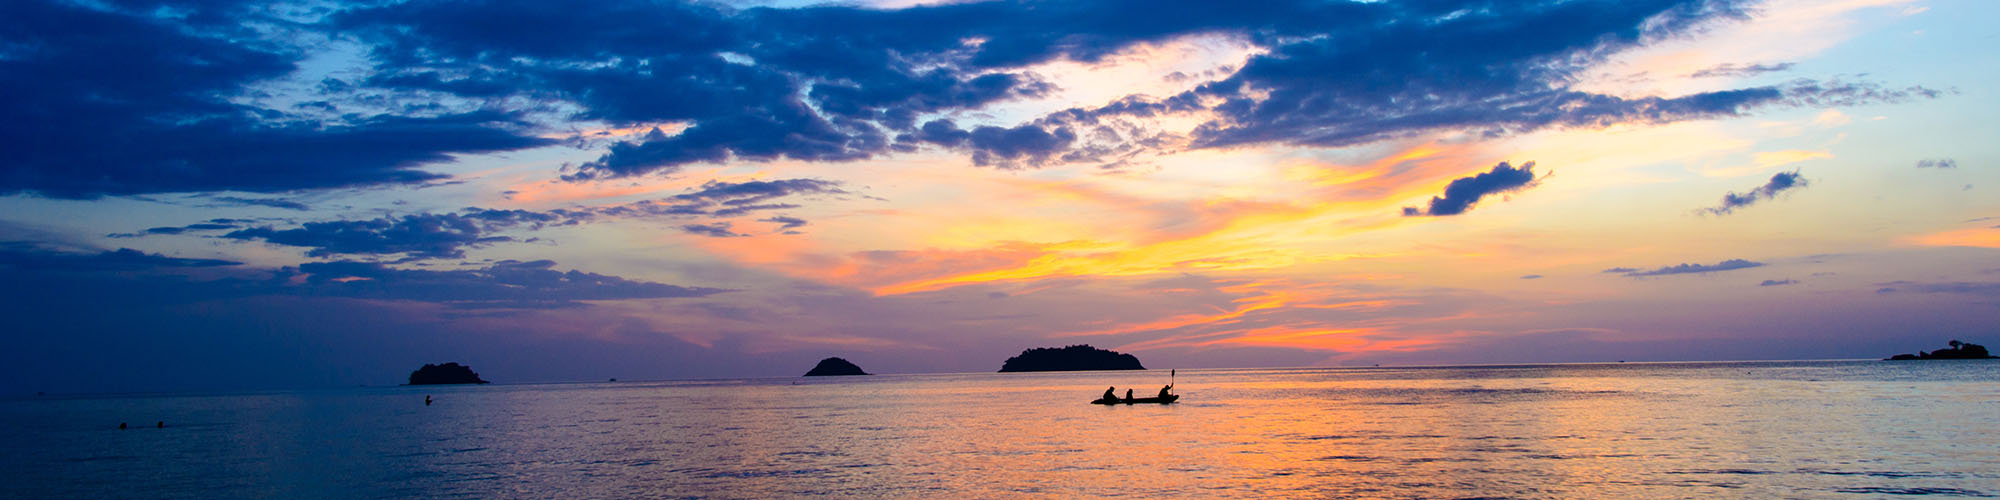 Thailand, Sonnenuntergang, Koh Chang